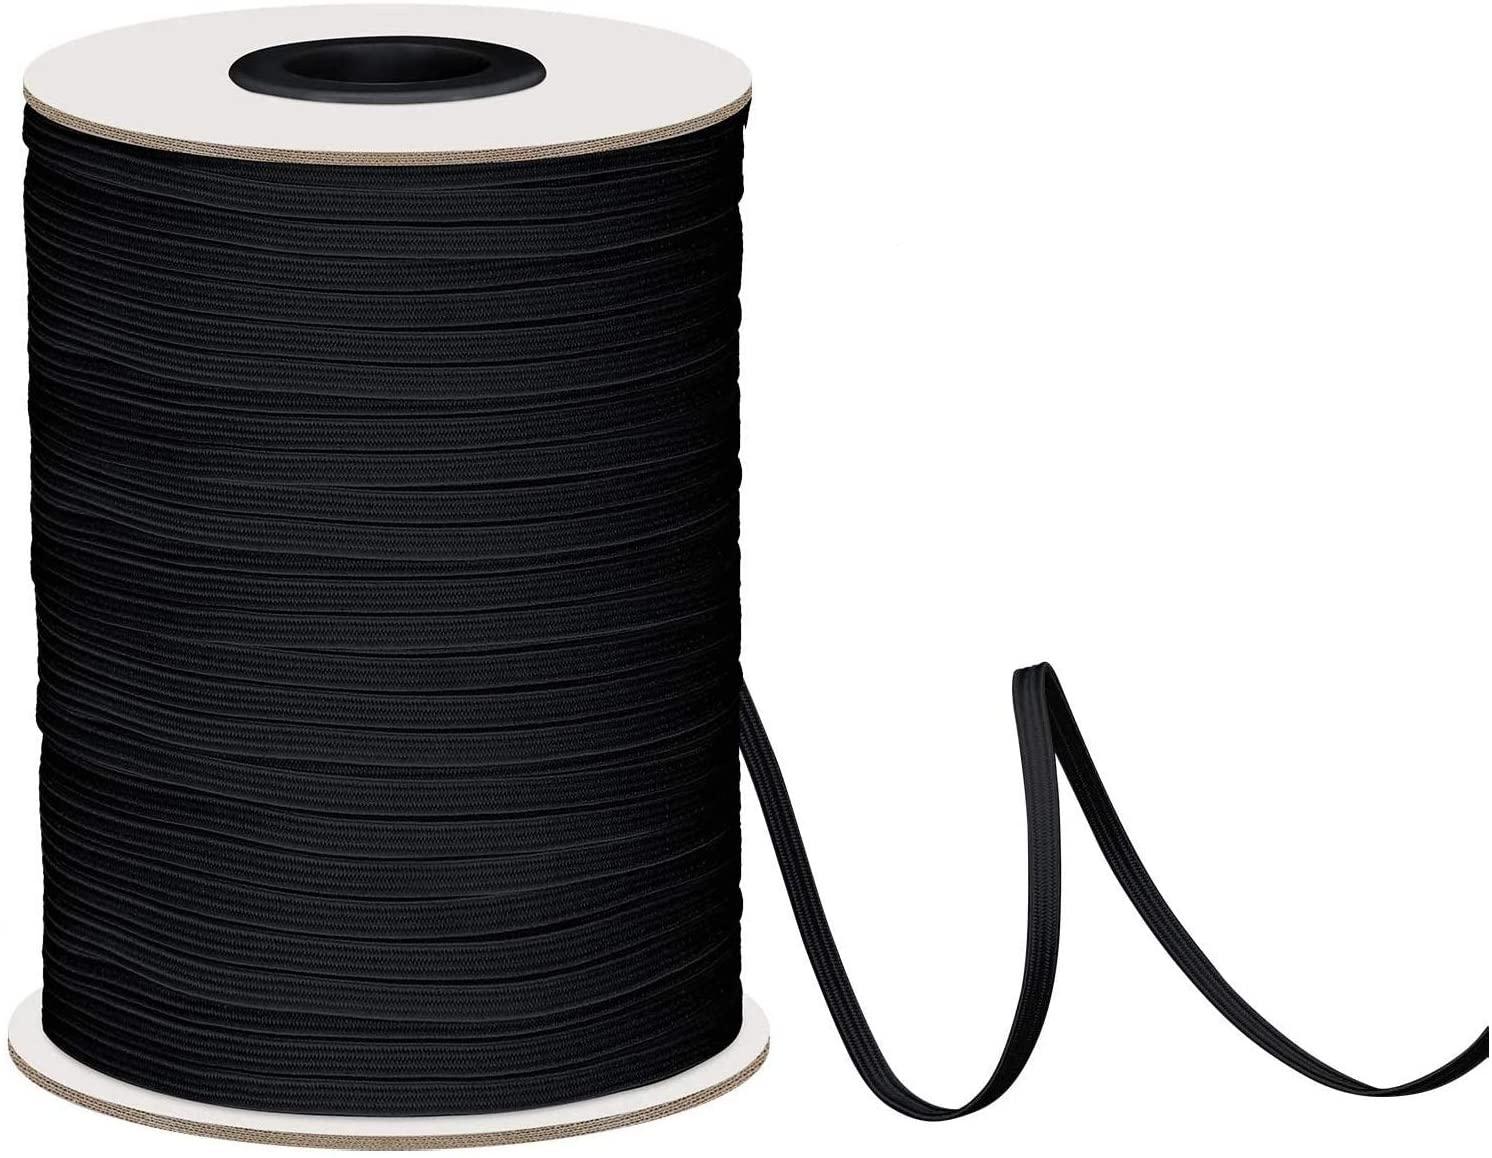 Elastic Band for Sewing Elastic Cord Braided Elastic Rope Elastic Spool Elastic String High Elasticity Knit Heavy Stretch for Sewing Crafts DIY Bedspread Cuff (1/8 inch 3mm 200 Yards Black)